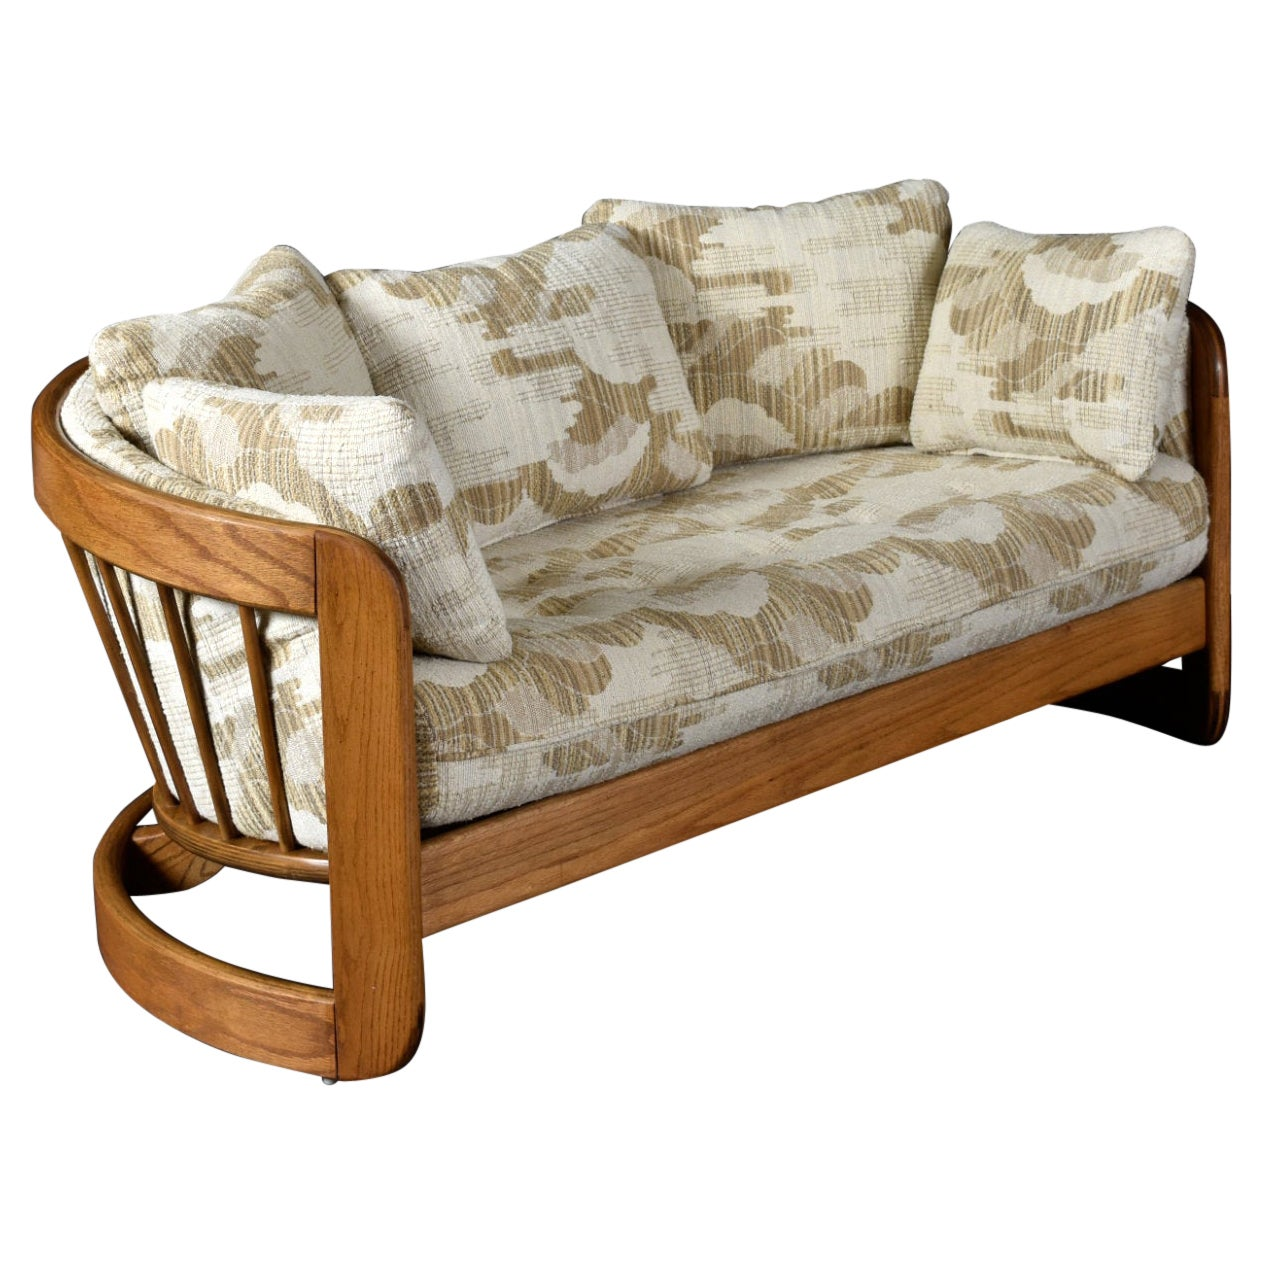 1980s Howard Solid Oak Barrel Shaped Loveseat Sofa